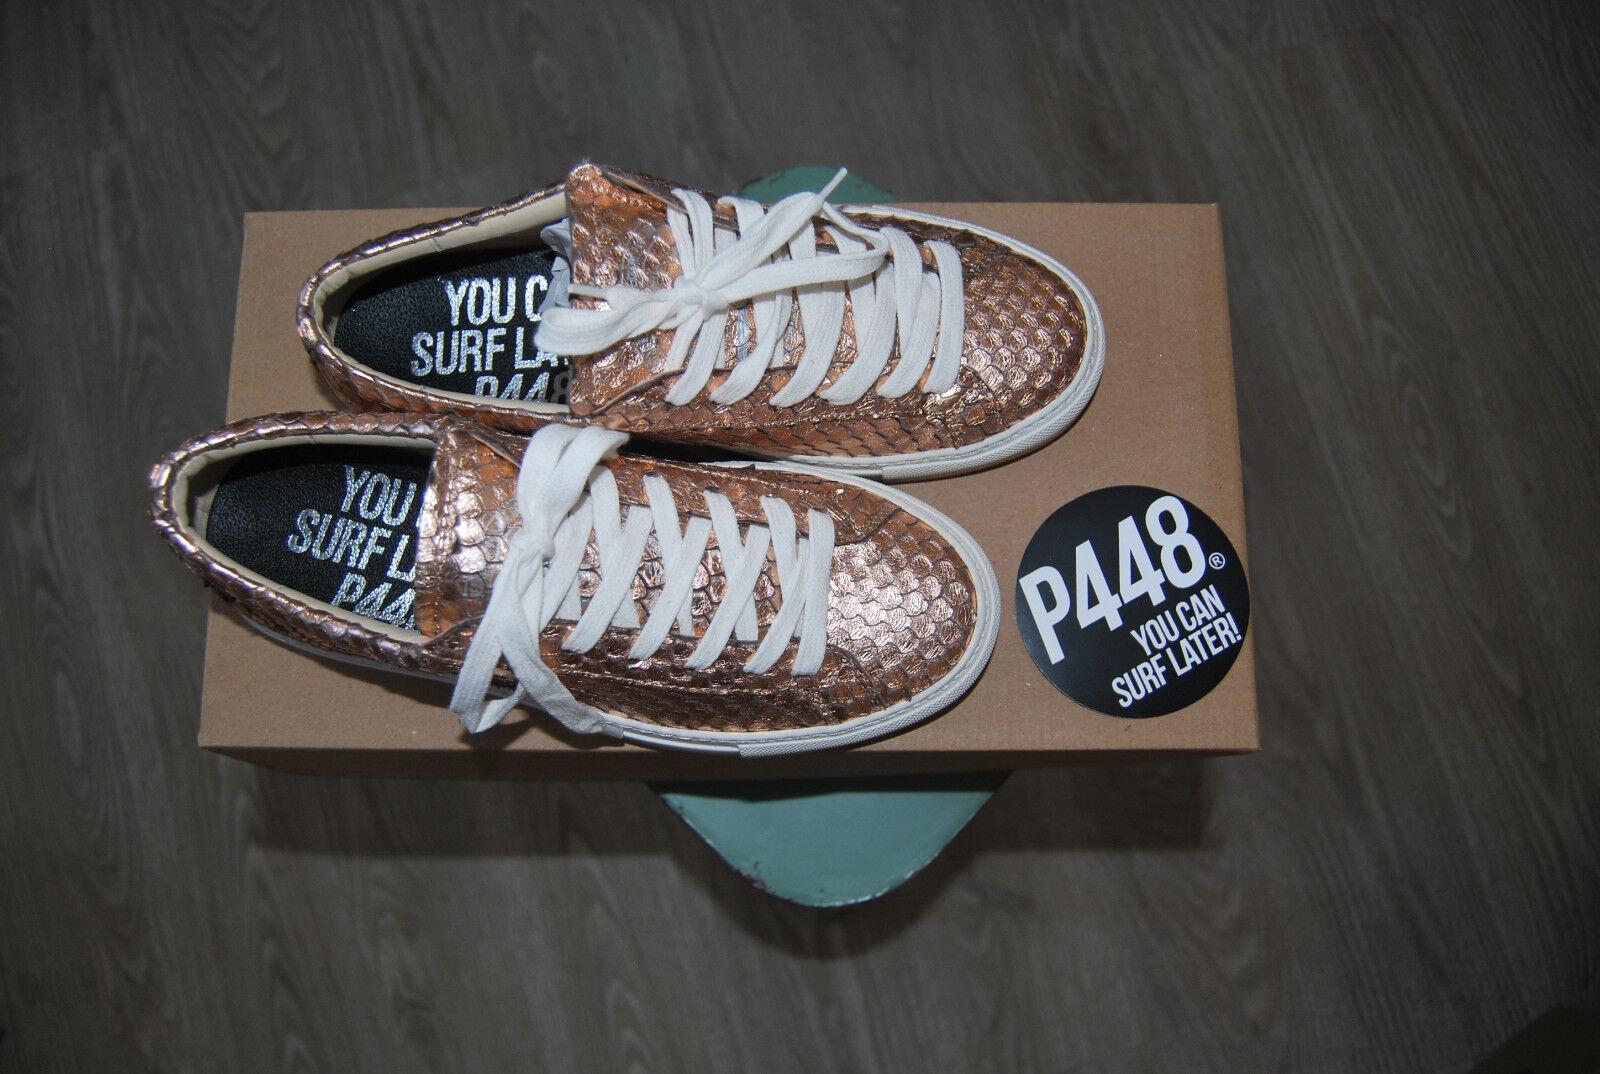 P448 VIP e7 ONE ROSA VIP P448 Sneaker Donna UVP 212,-€ 9af87e